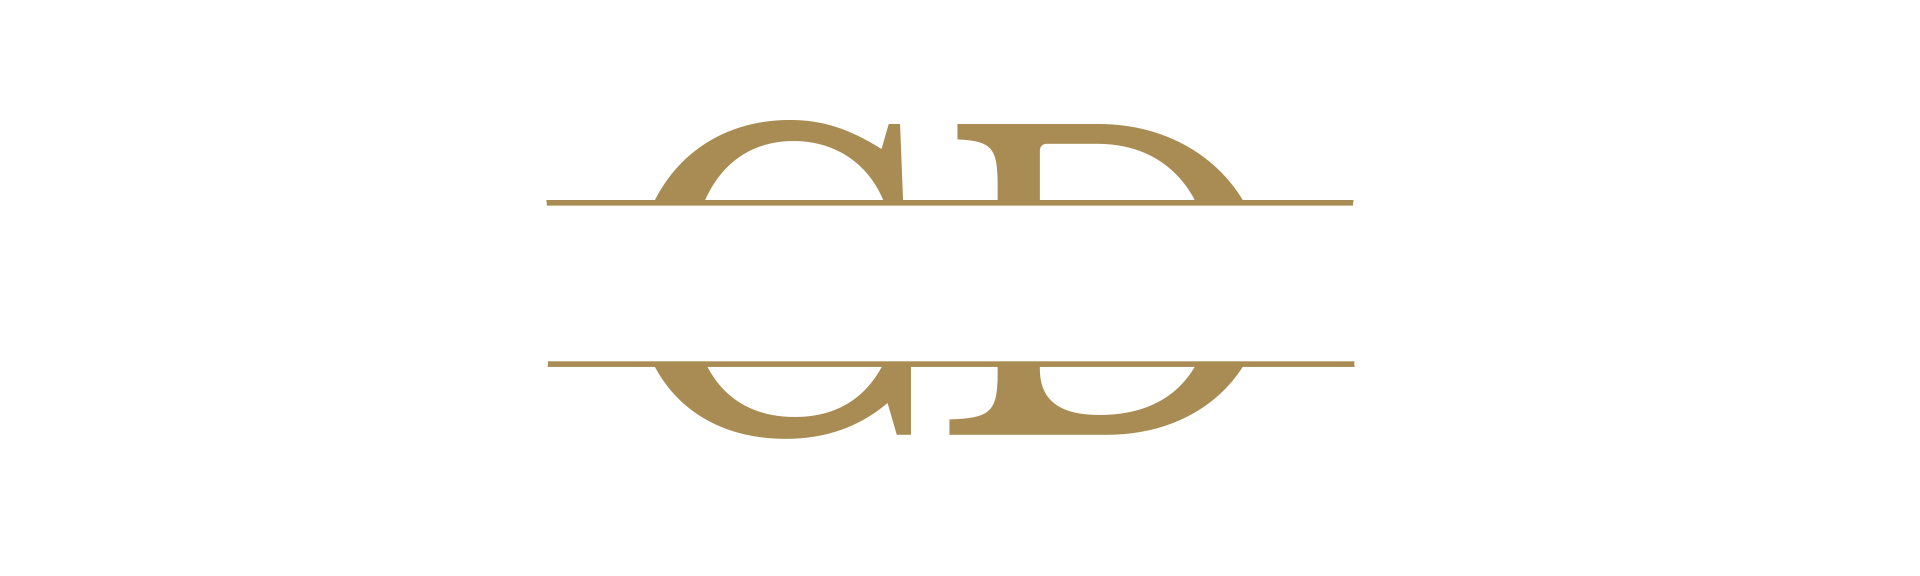 Cosmo Companies